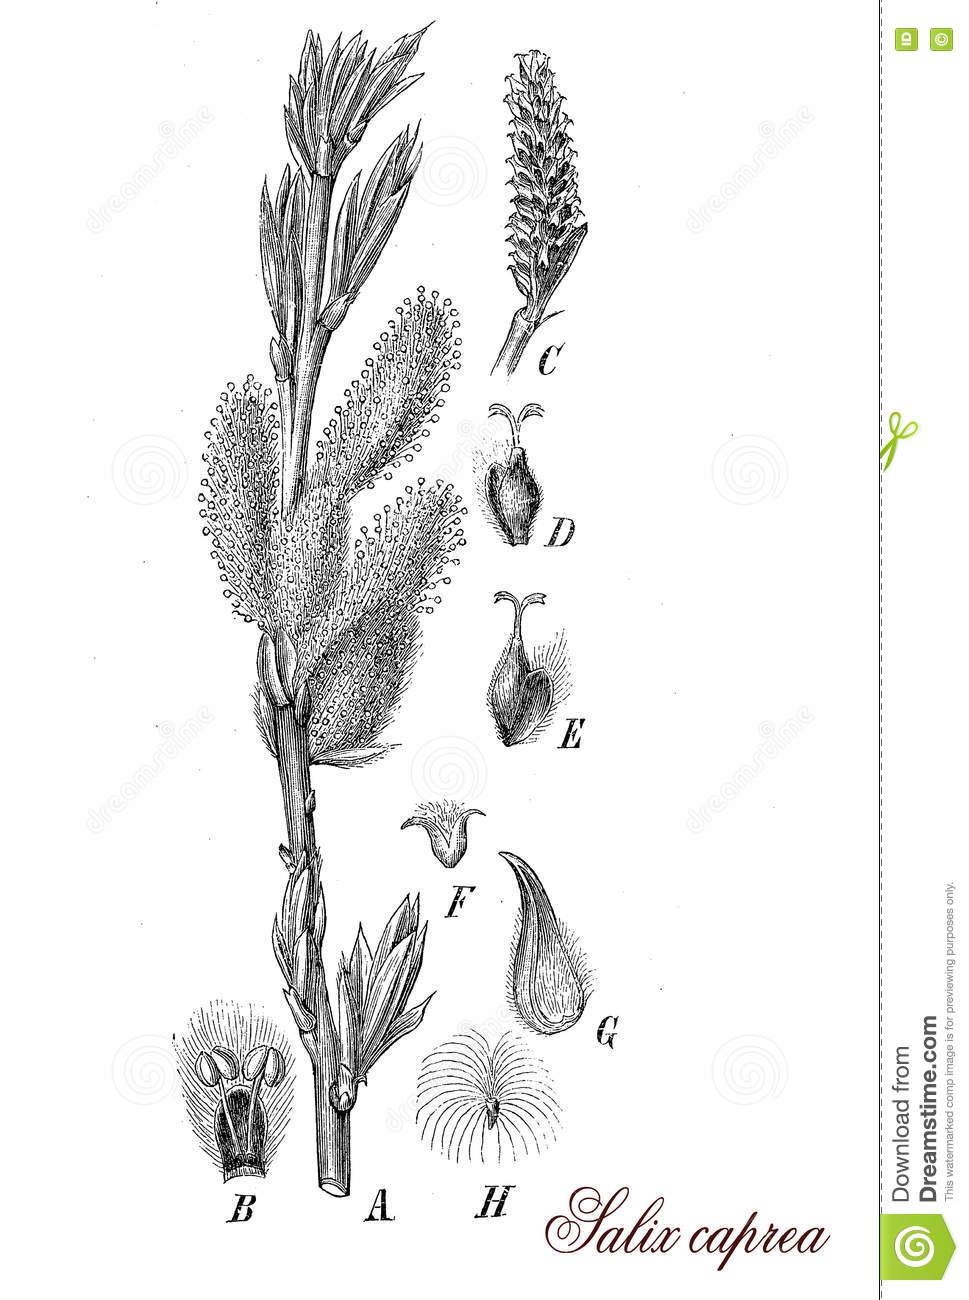 Salix Caprea Or Goat Willow, Botanical Vintage Engraving Stock.